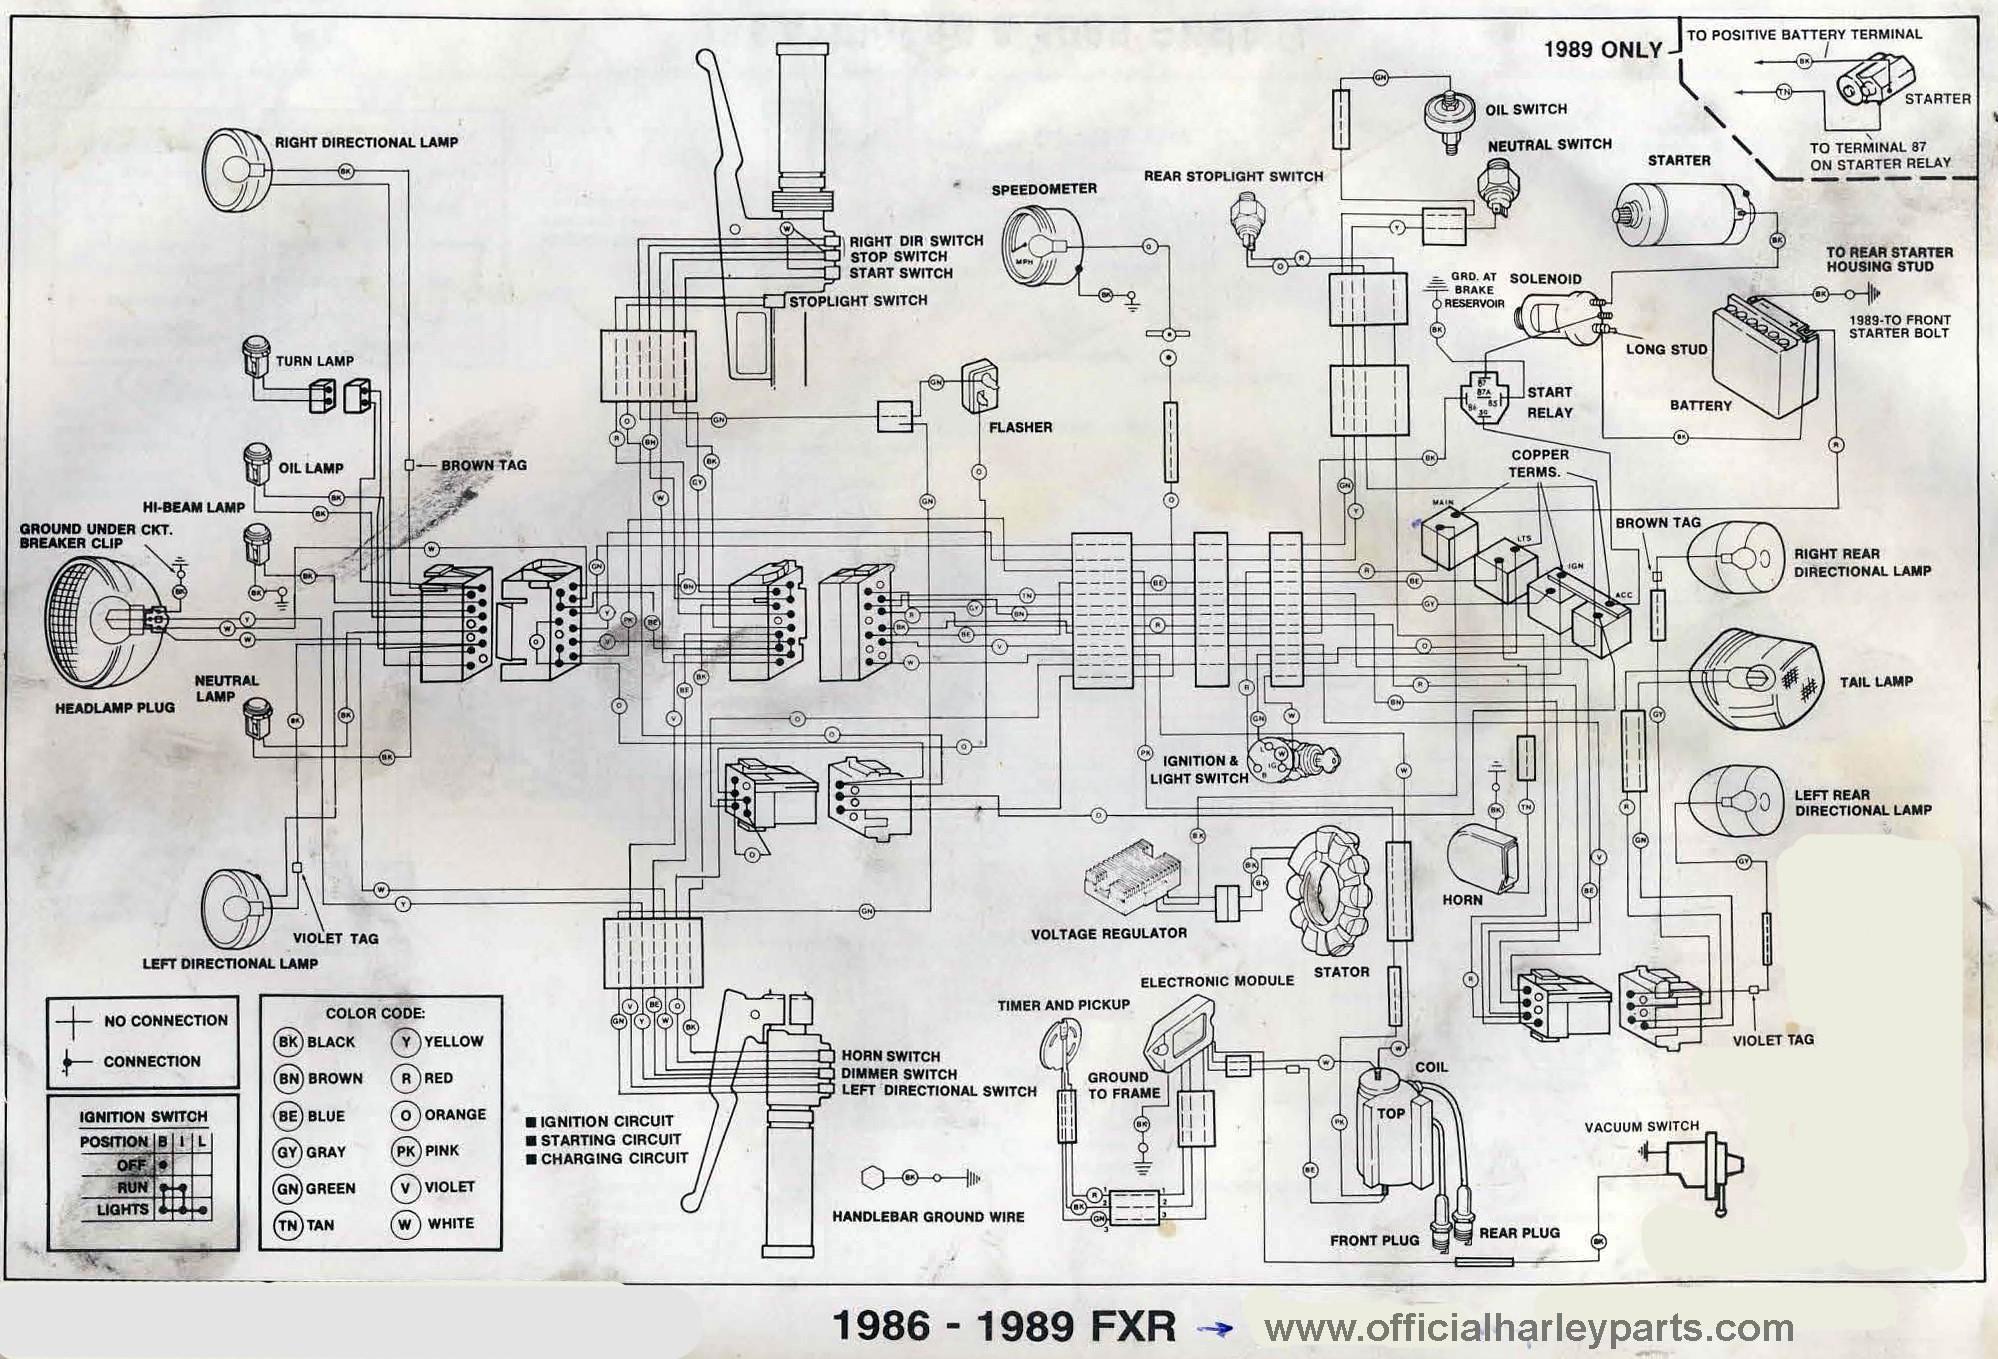 Fxr Wiring    Diagram      Wiring Diagrams